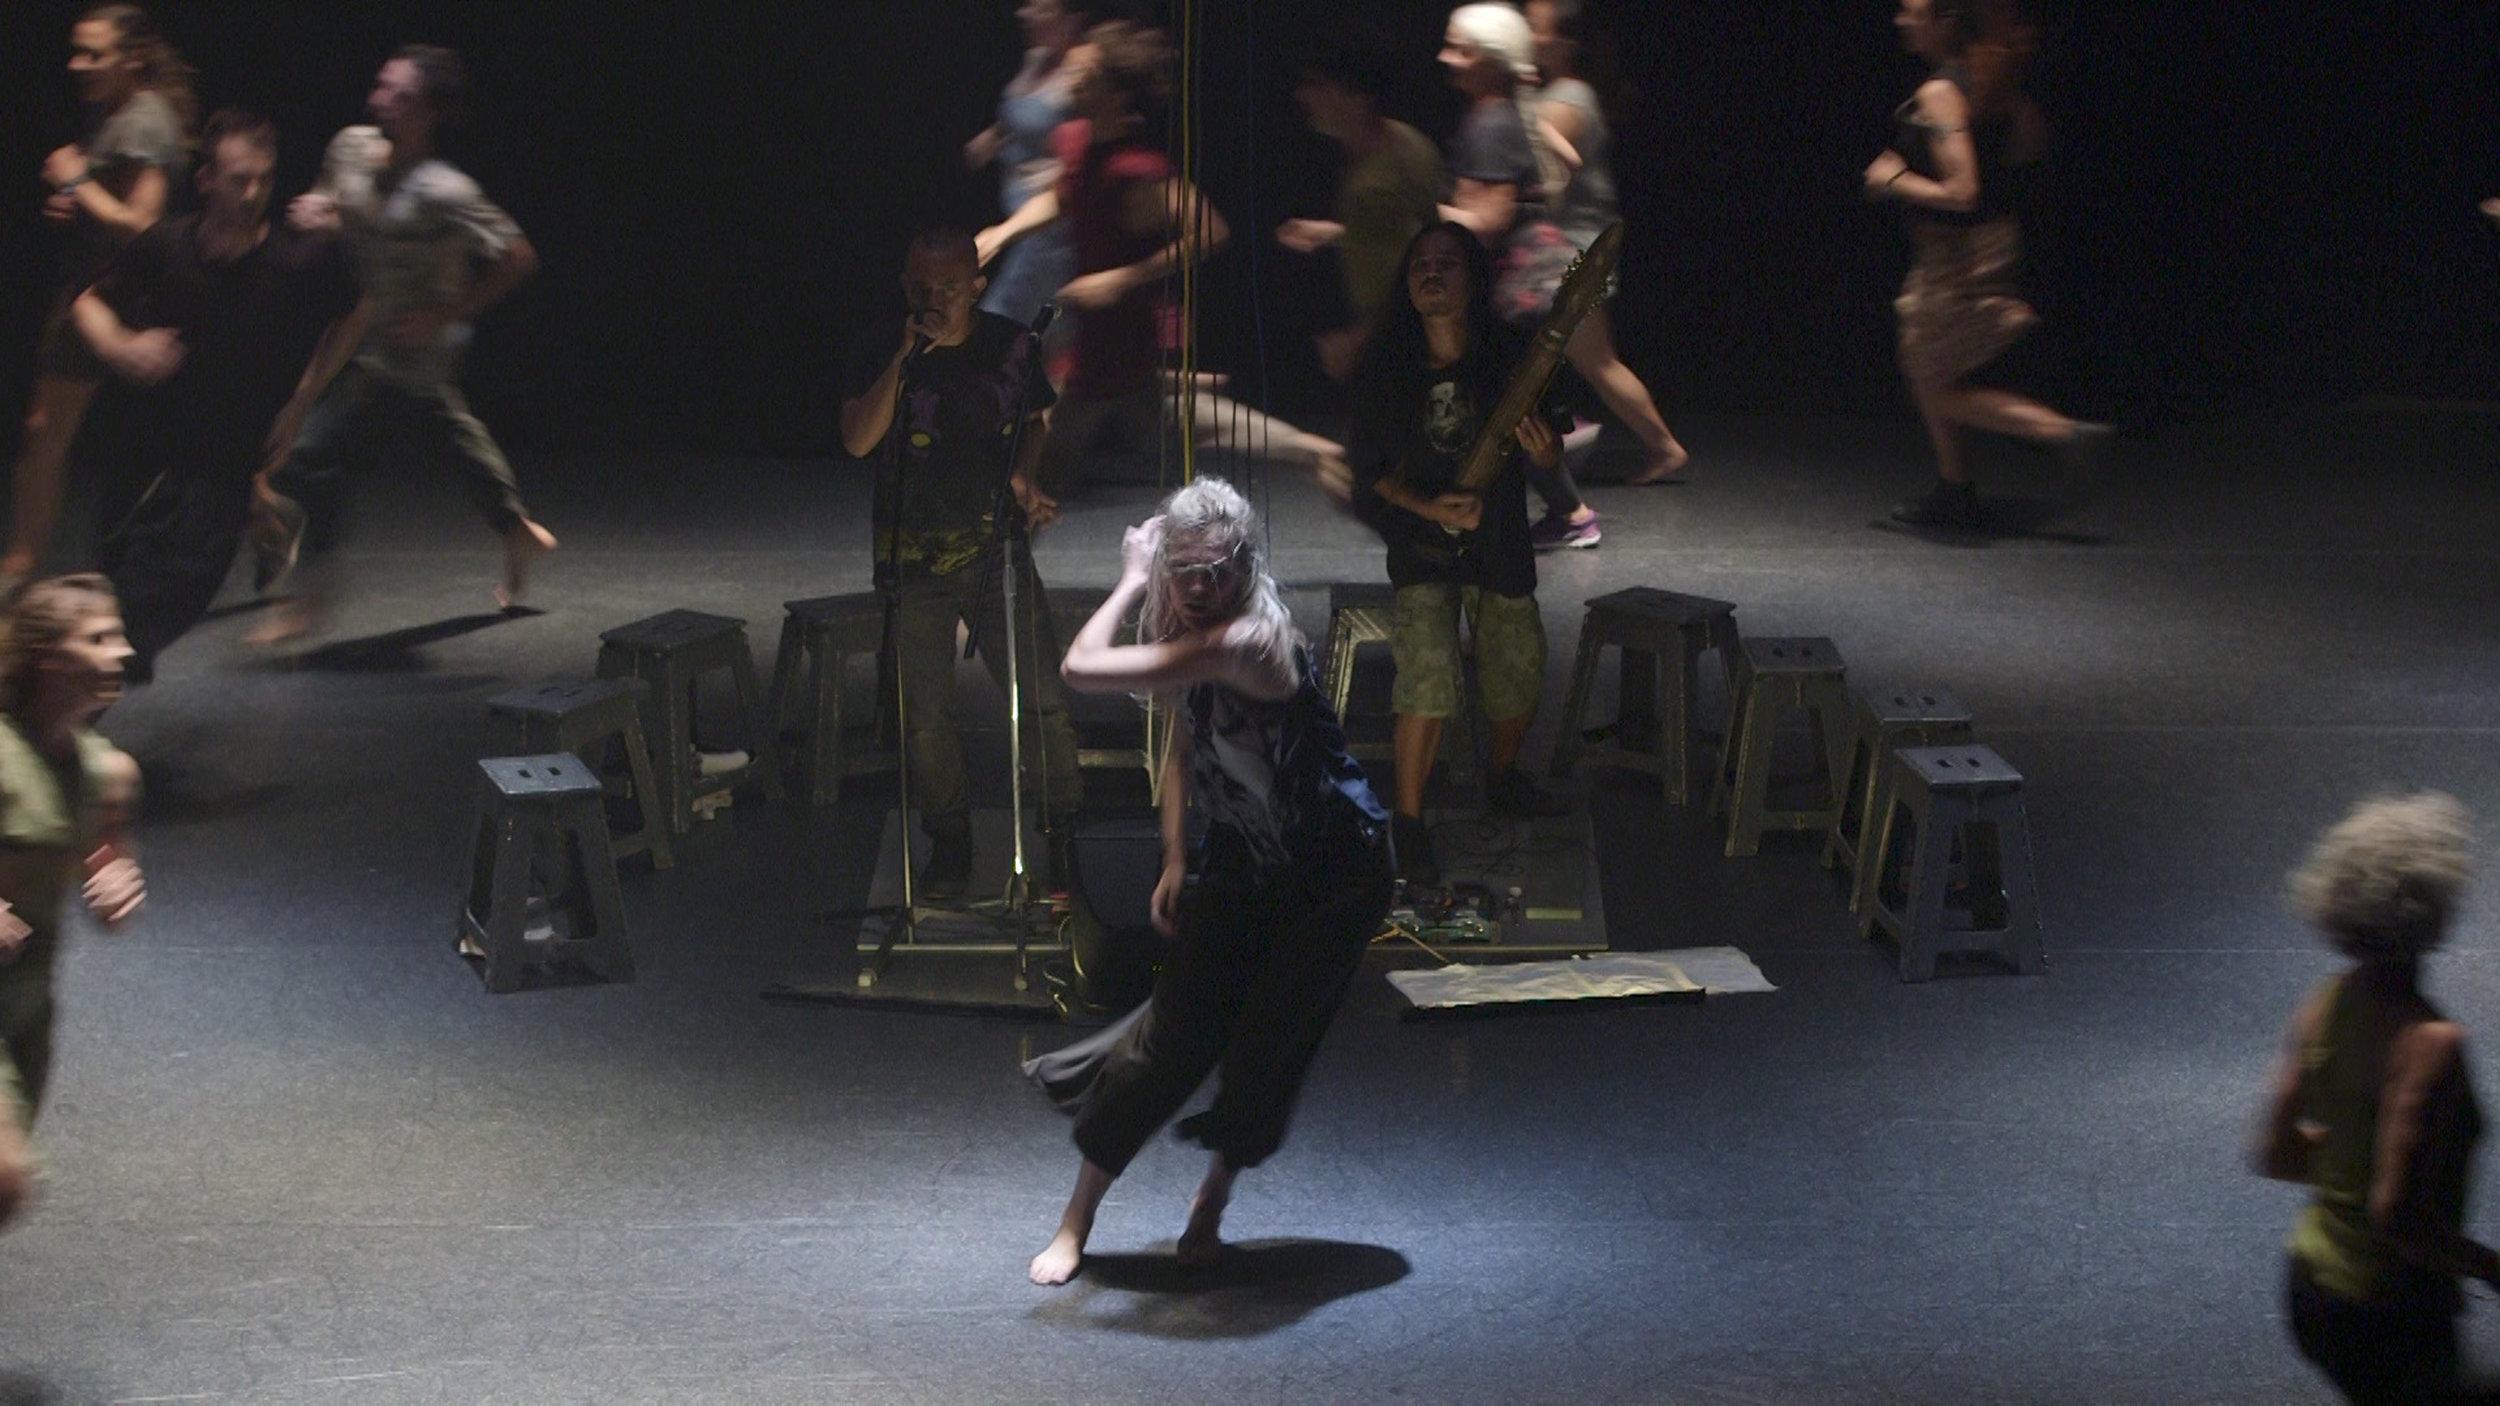 attractorclarice performing arts centre4 may -